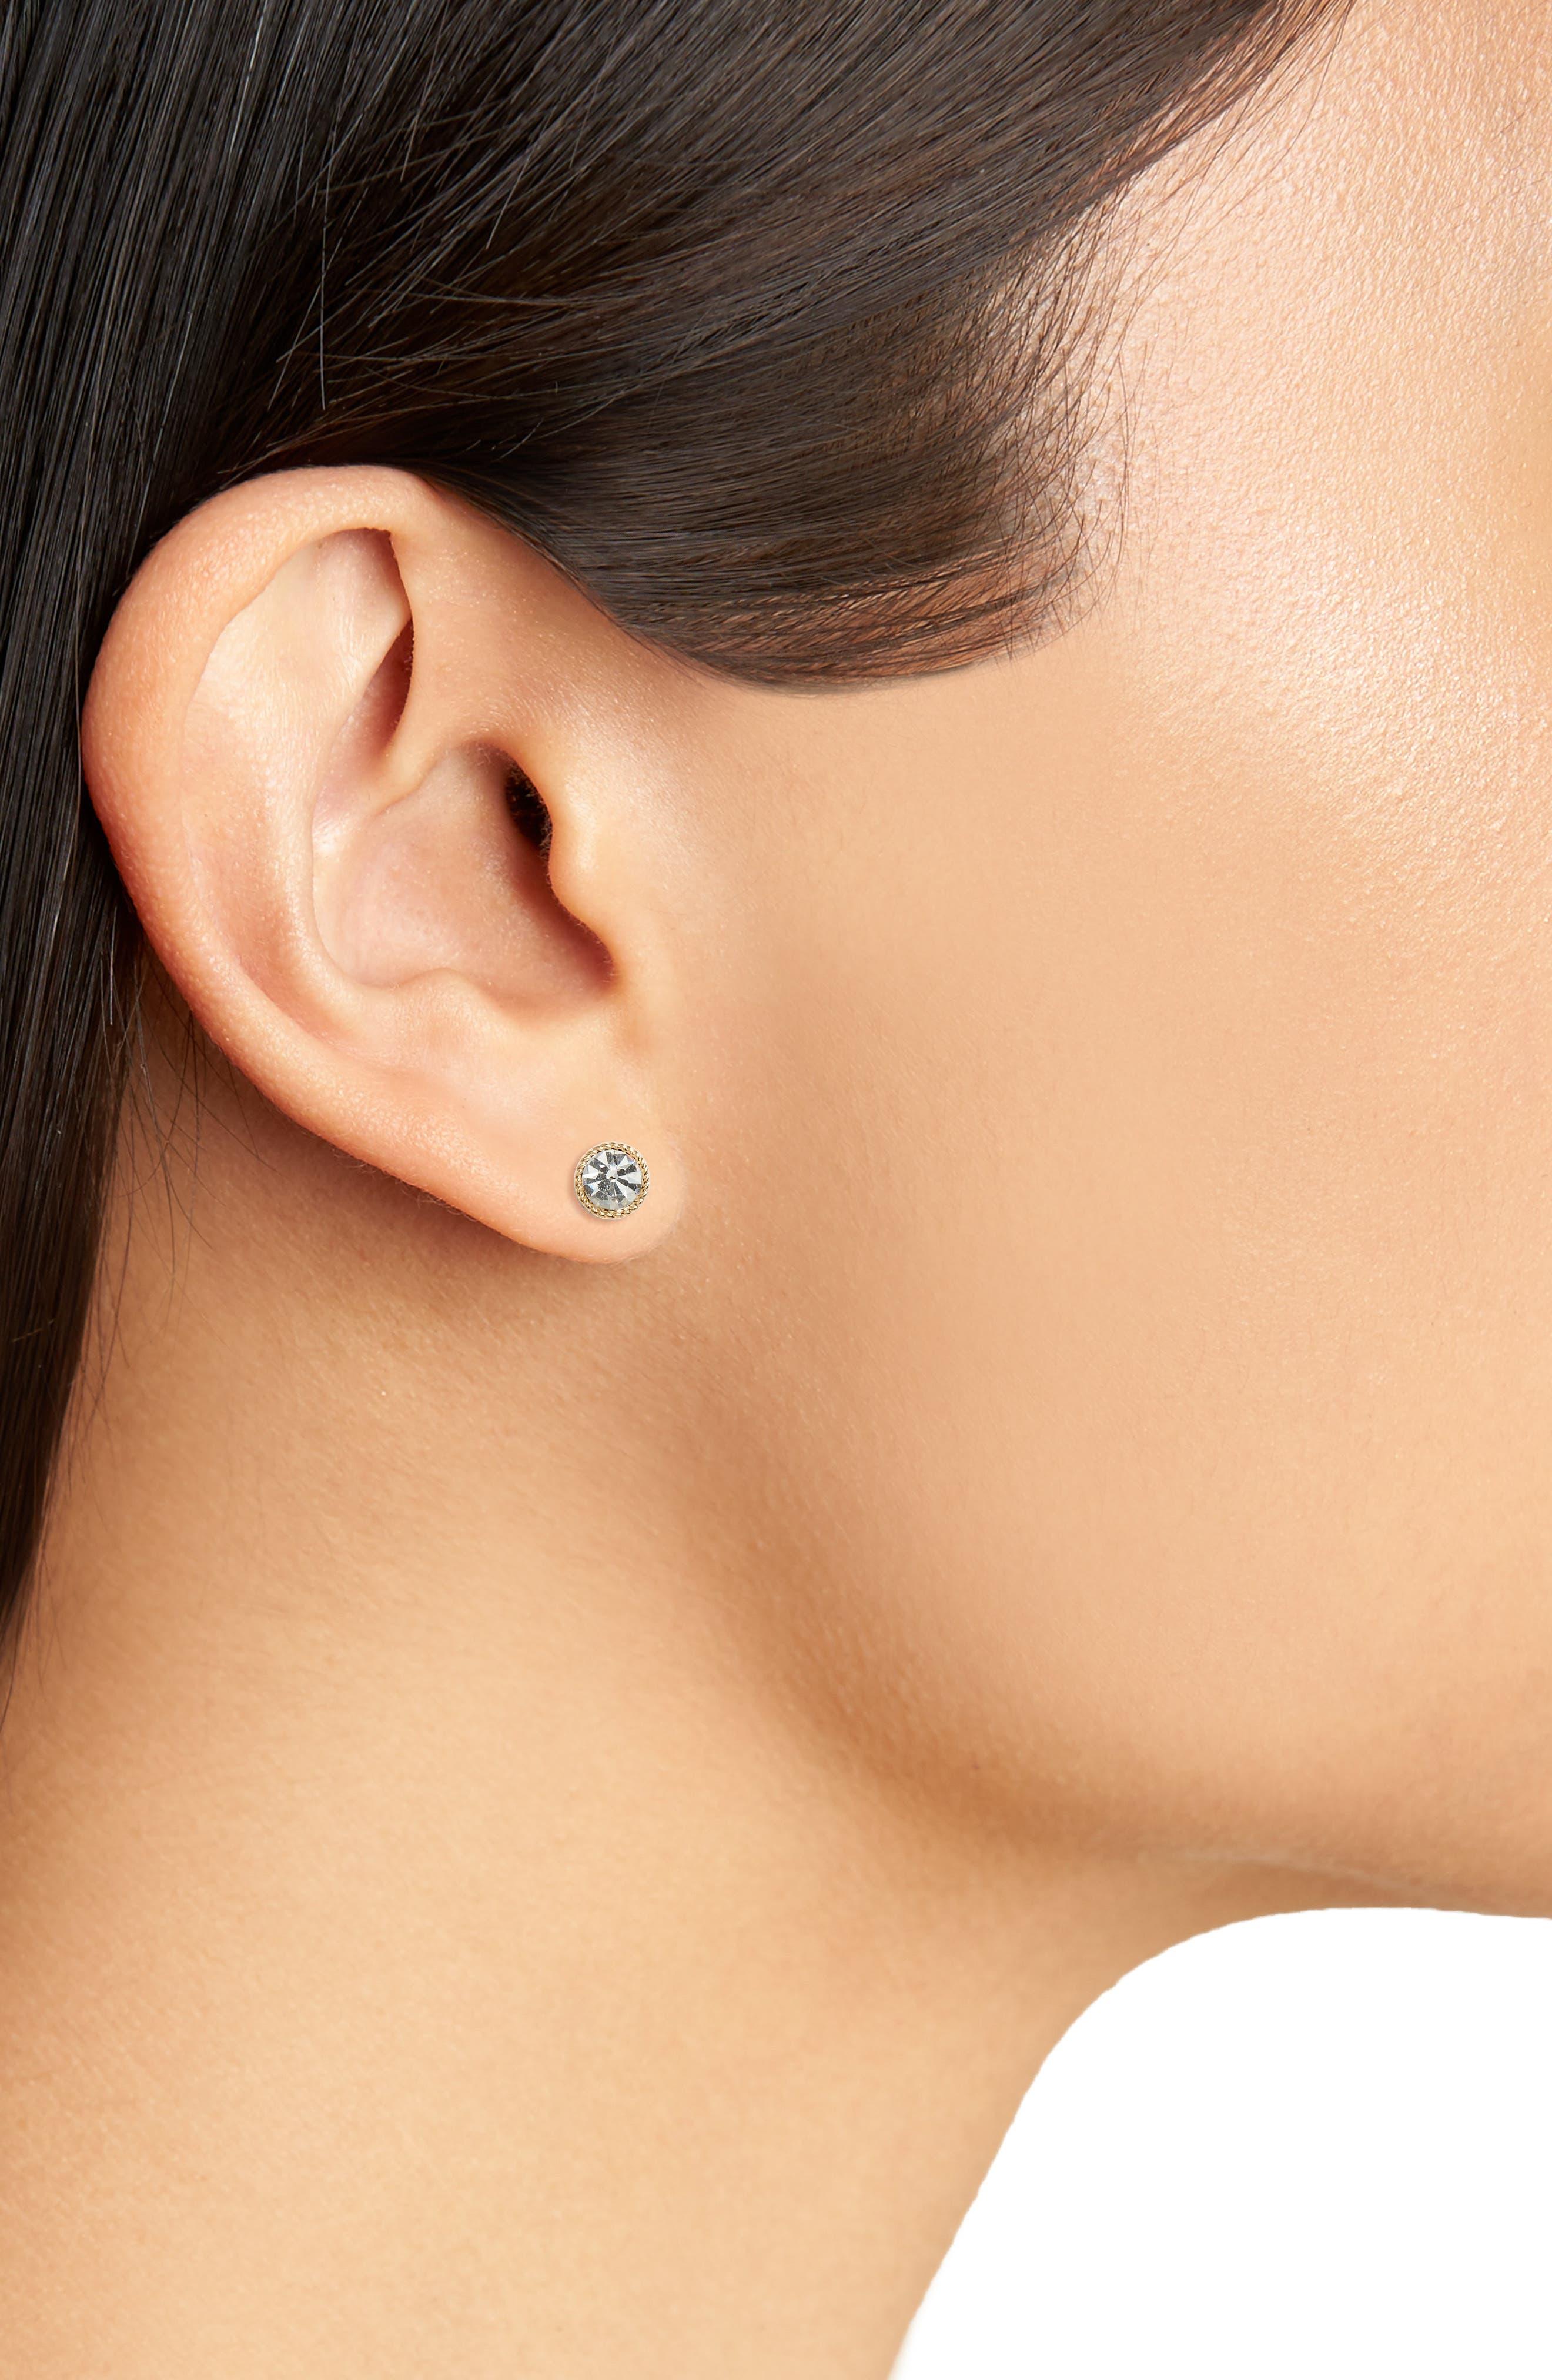 Set of 4 Stud Earrings,                             Alternate thumbnail 2, color,                             Gold/ Crystal